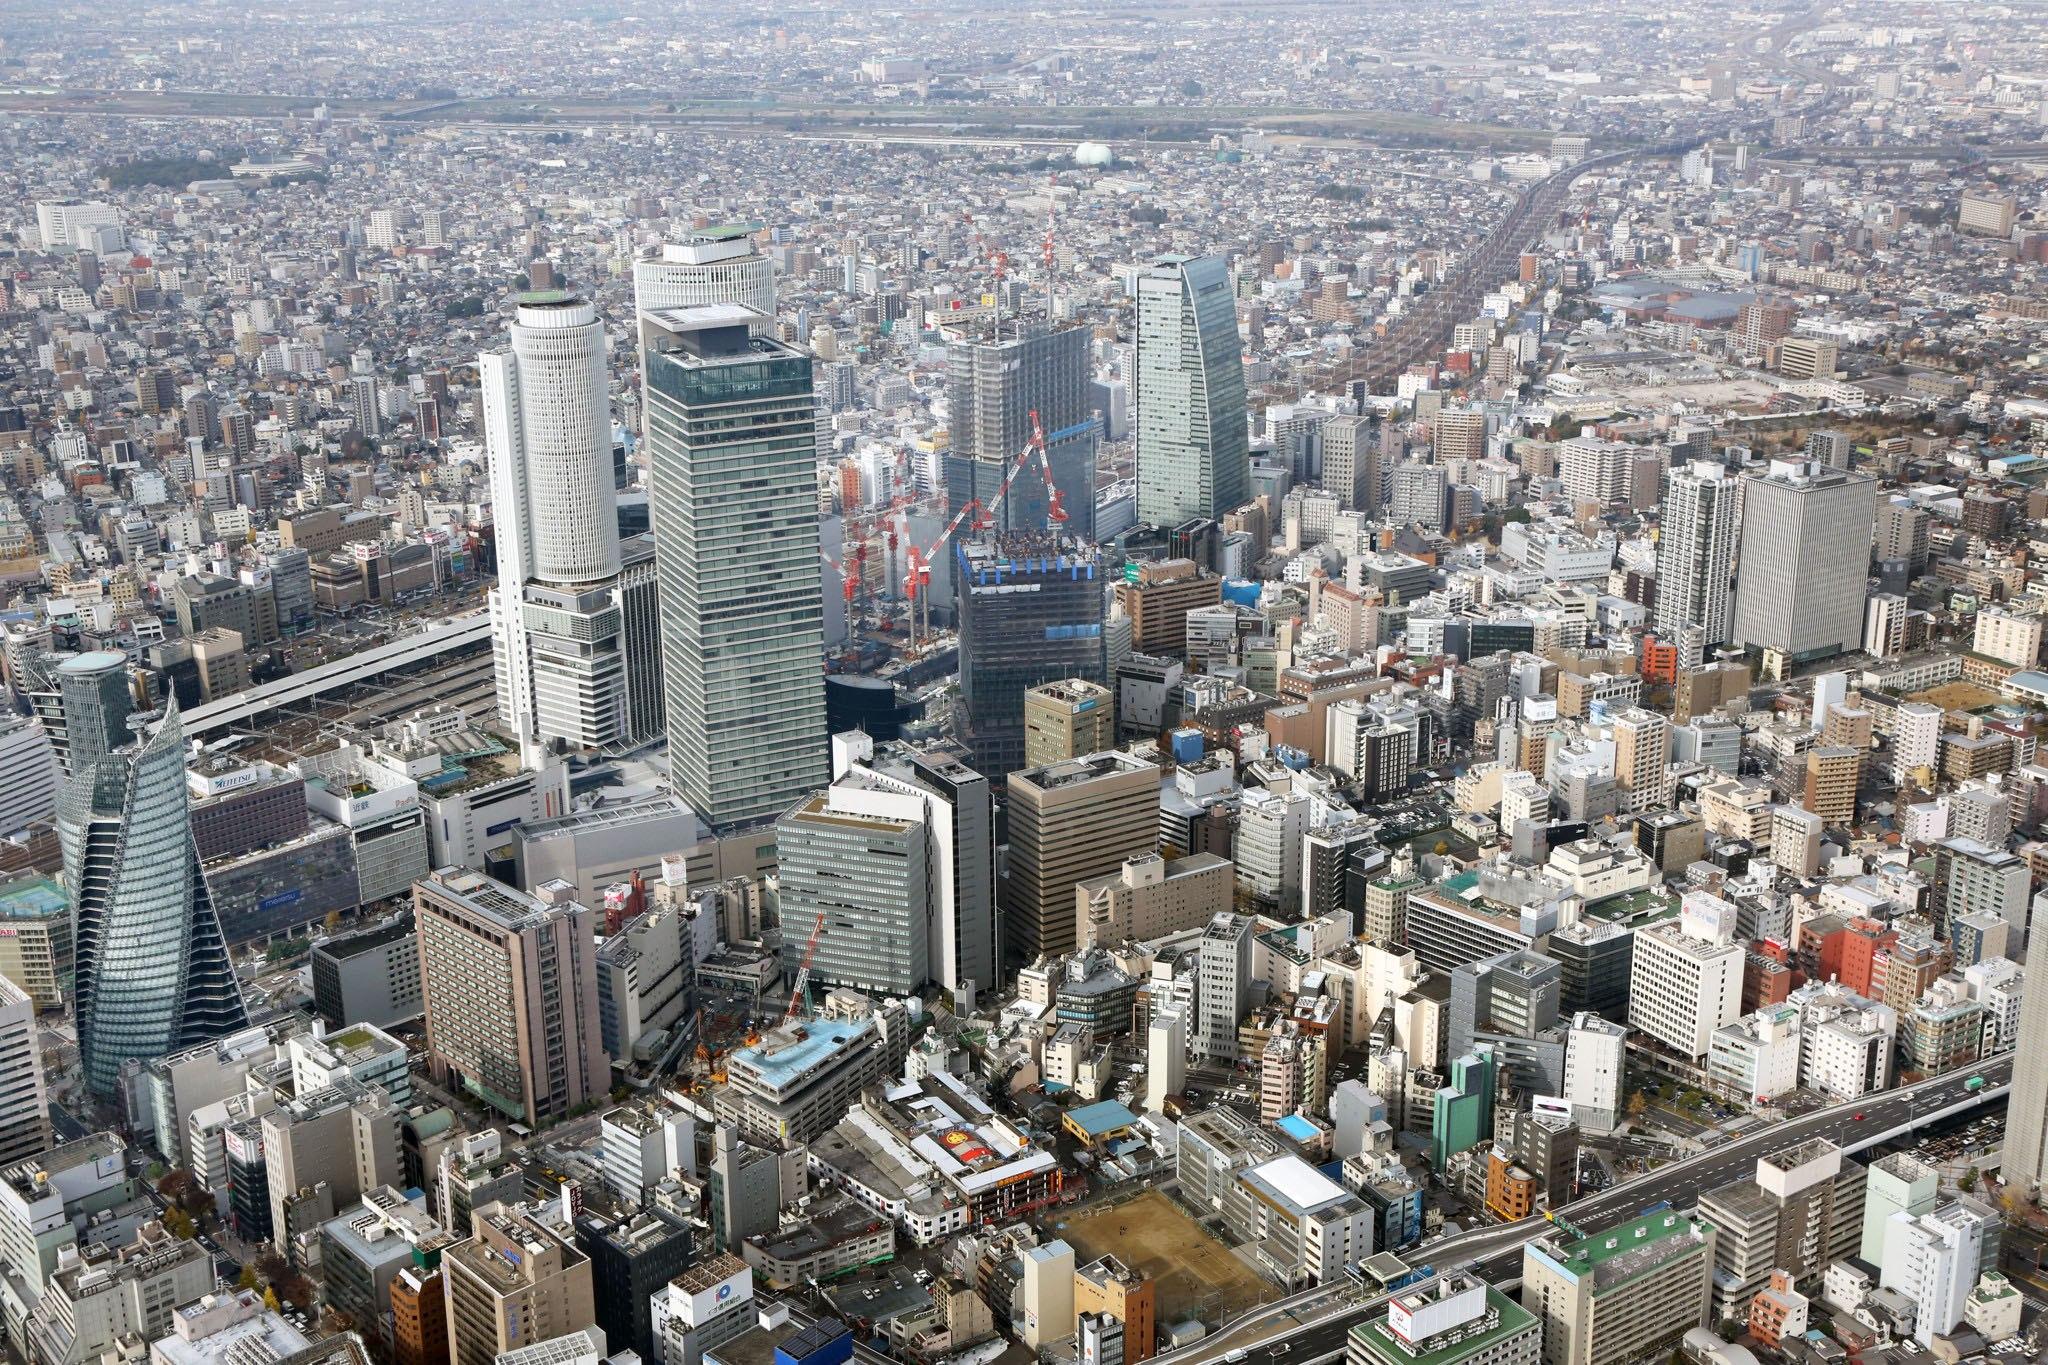 Nagoya Chiba integrated resort